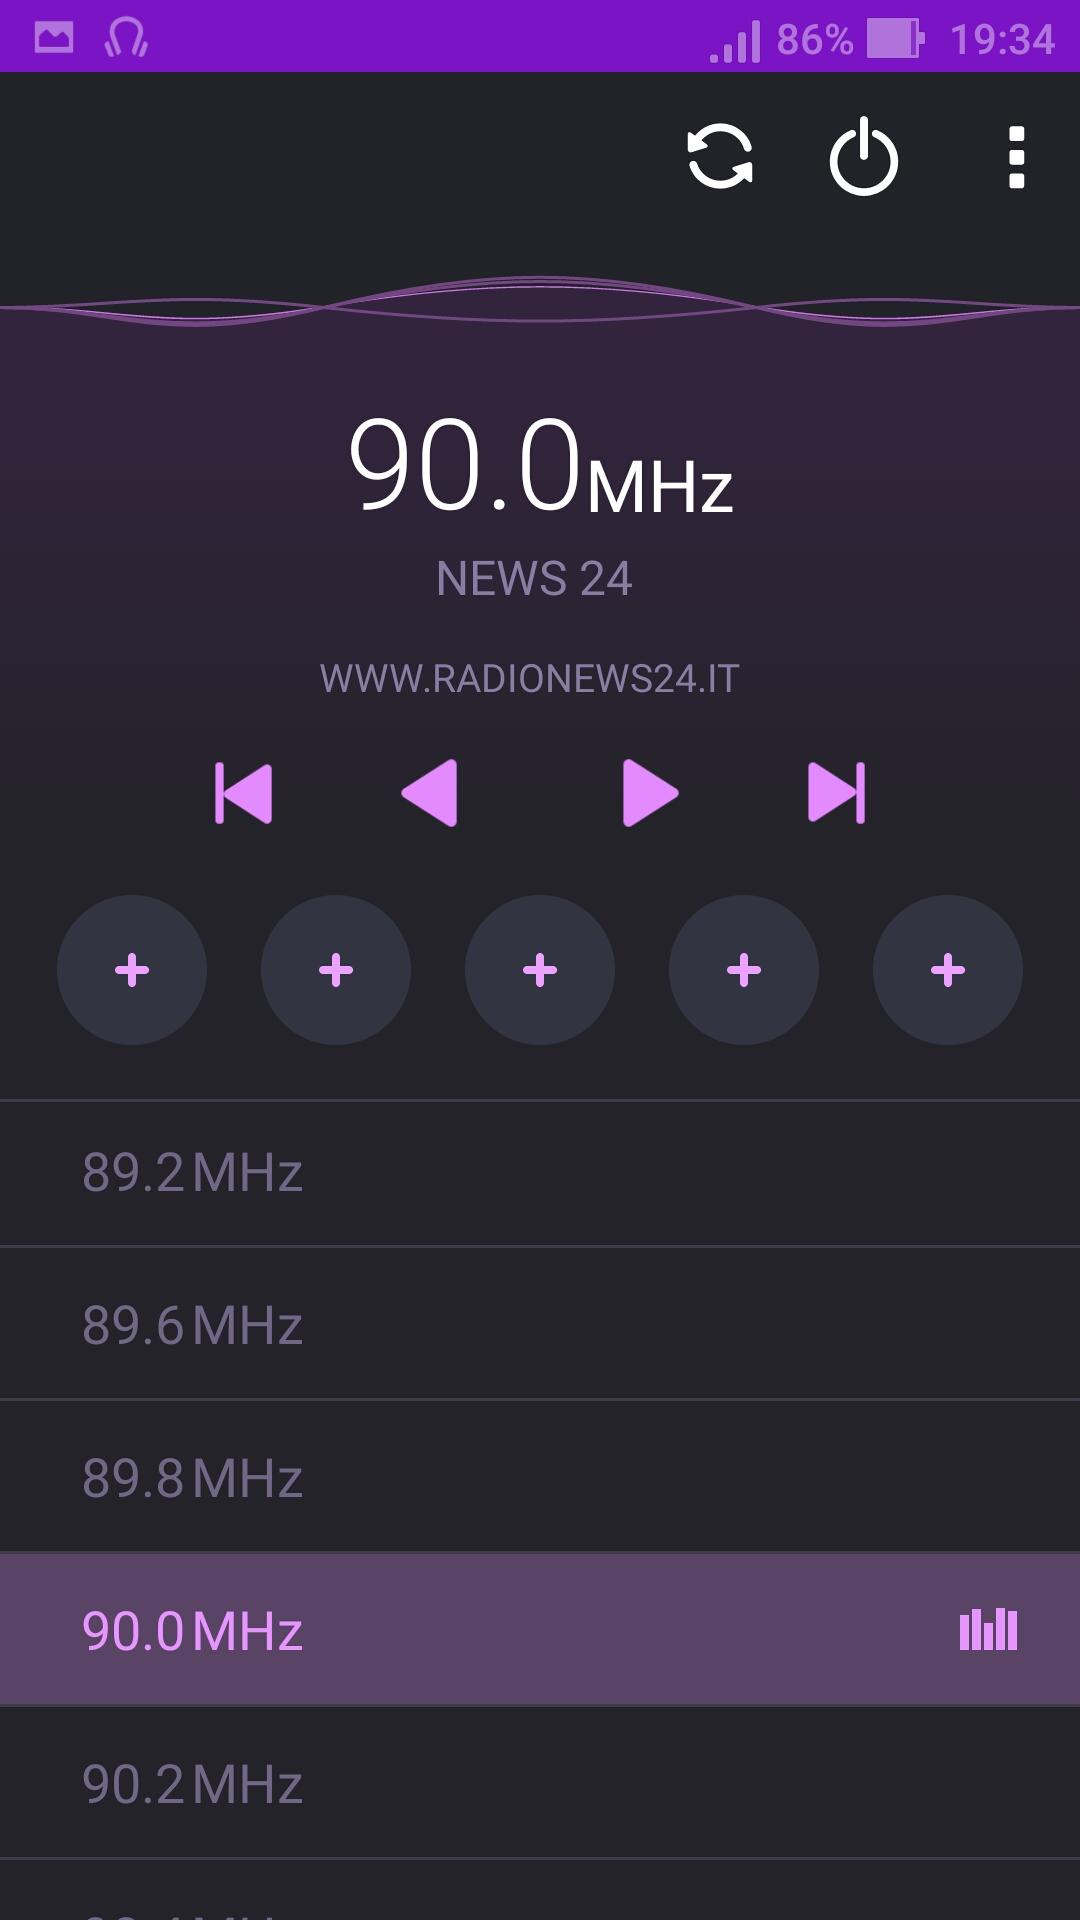 Radio News 24 anche su 89.8 (sostituisce Radio Jukebox)